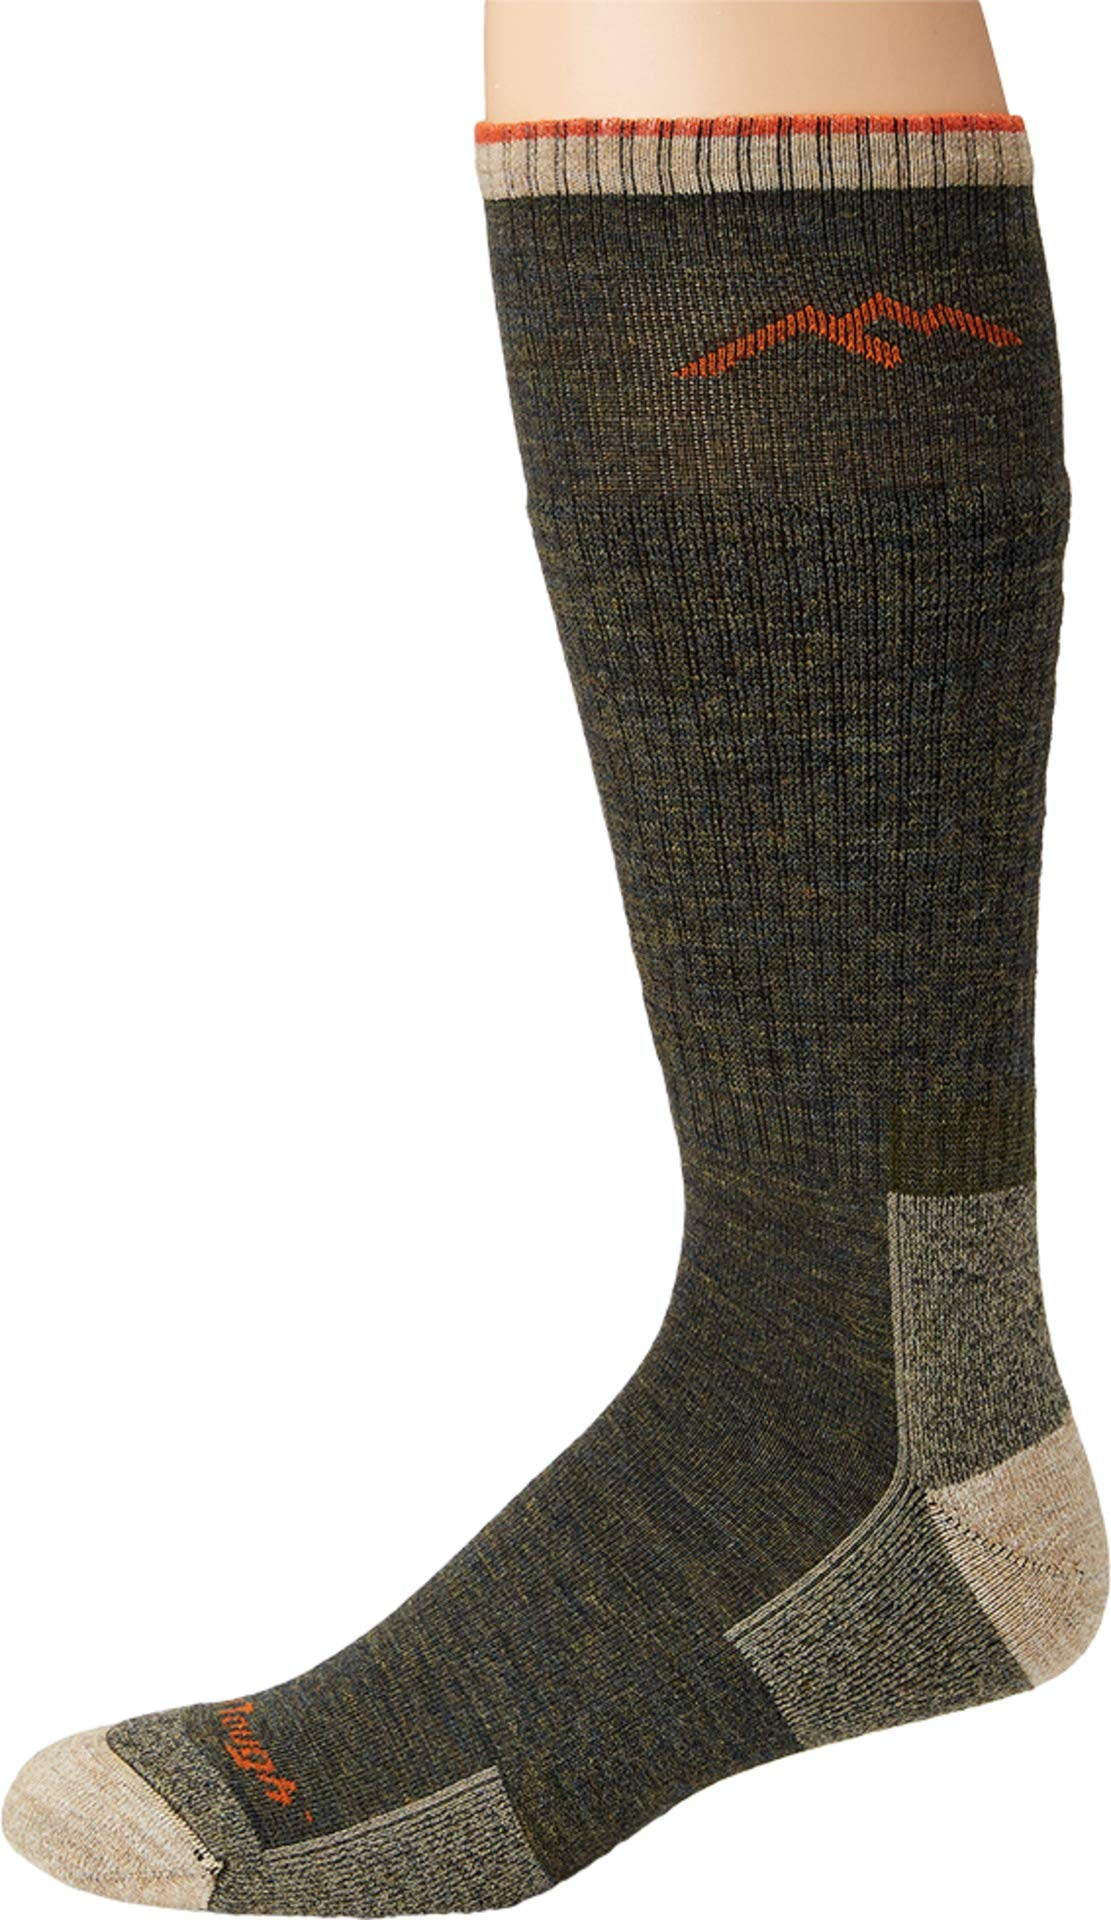 Darn Tough Merino Wool Boot Socks Cushion - Men's Olive X-Large by Darn Tough